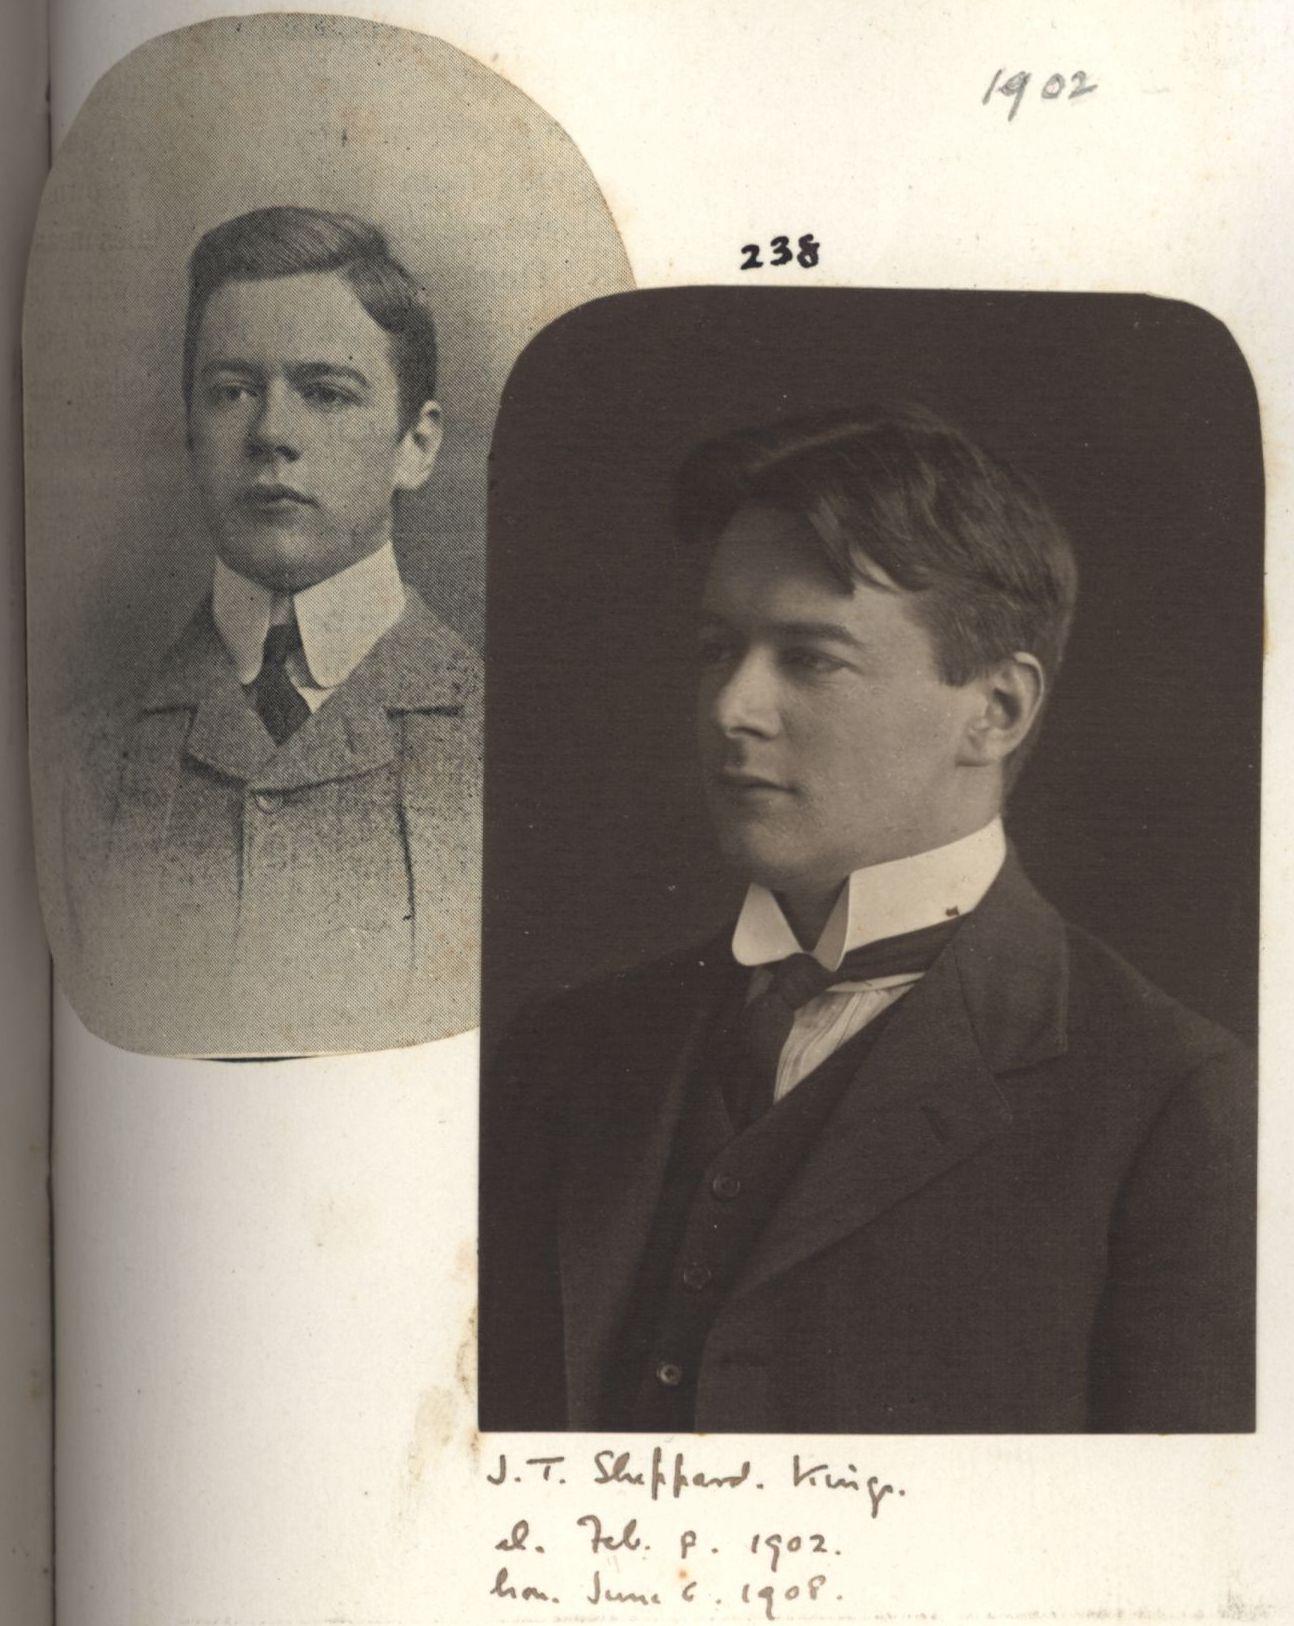 238: Sheppard, John Tresidder. [KCAS/39/4/1, Photobook, p.73]